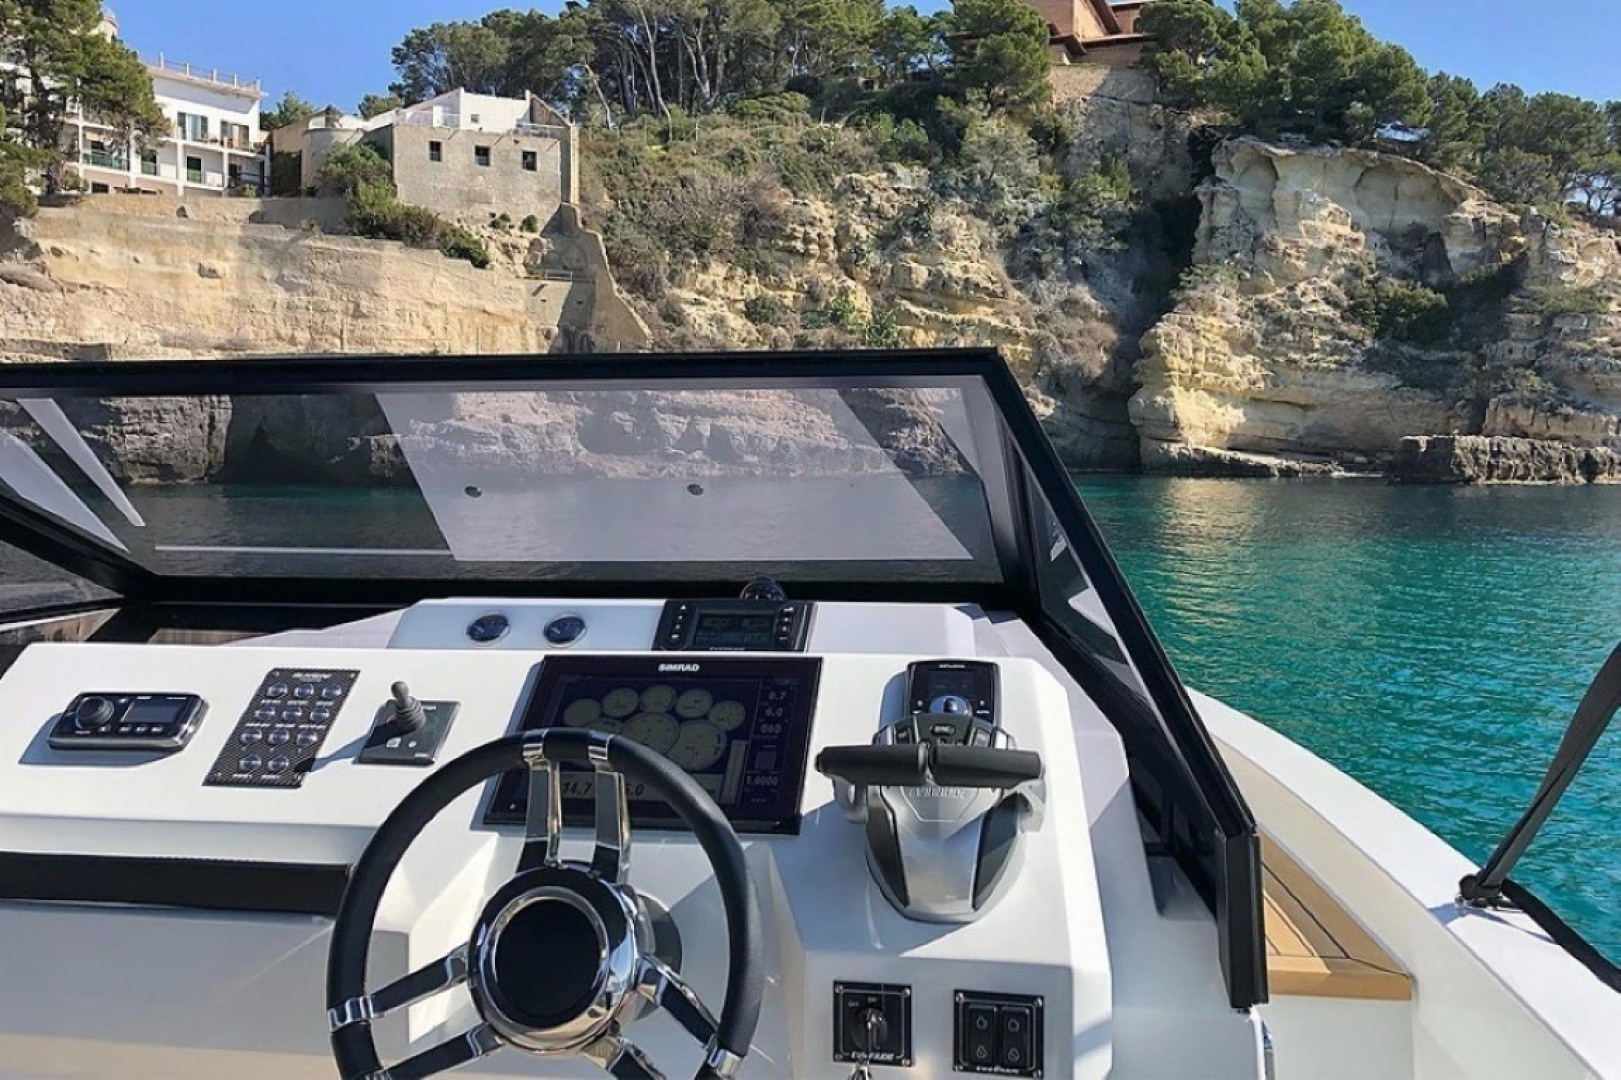 De Antonio-D34 Cruiser 2020-De Antonio Yachts D34 Cruiser Fort Lauderdale-Florida-United States-De Antonio Yachts D34 Cruiser Fort Lauderdale (13)-1549267 | Thumbnail